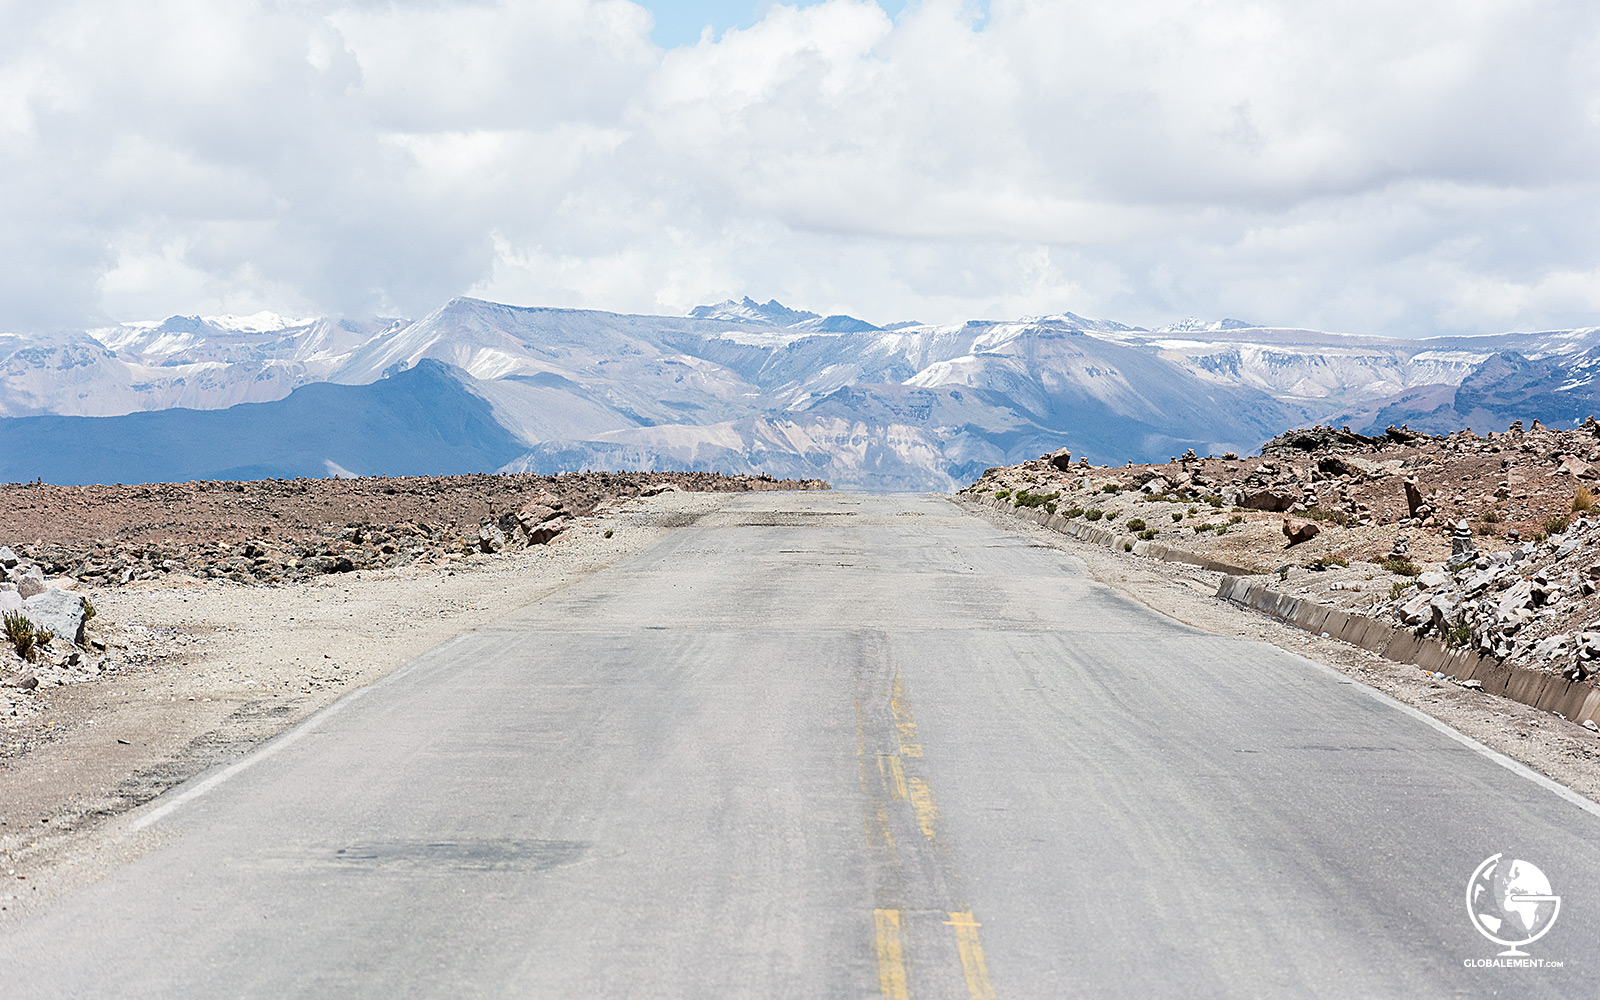 Patapampa Puno Chivay Arequipa